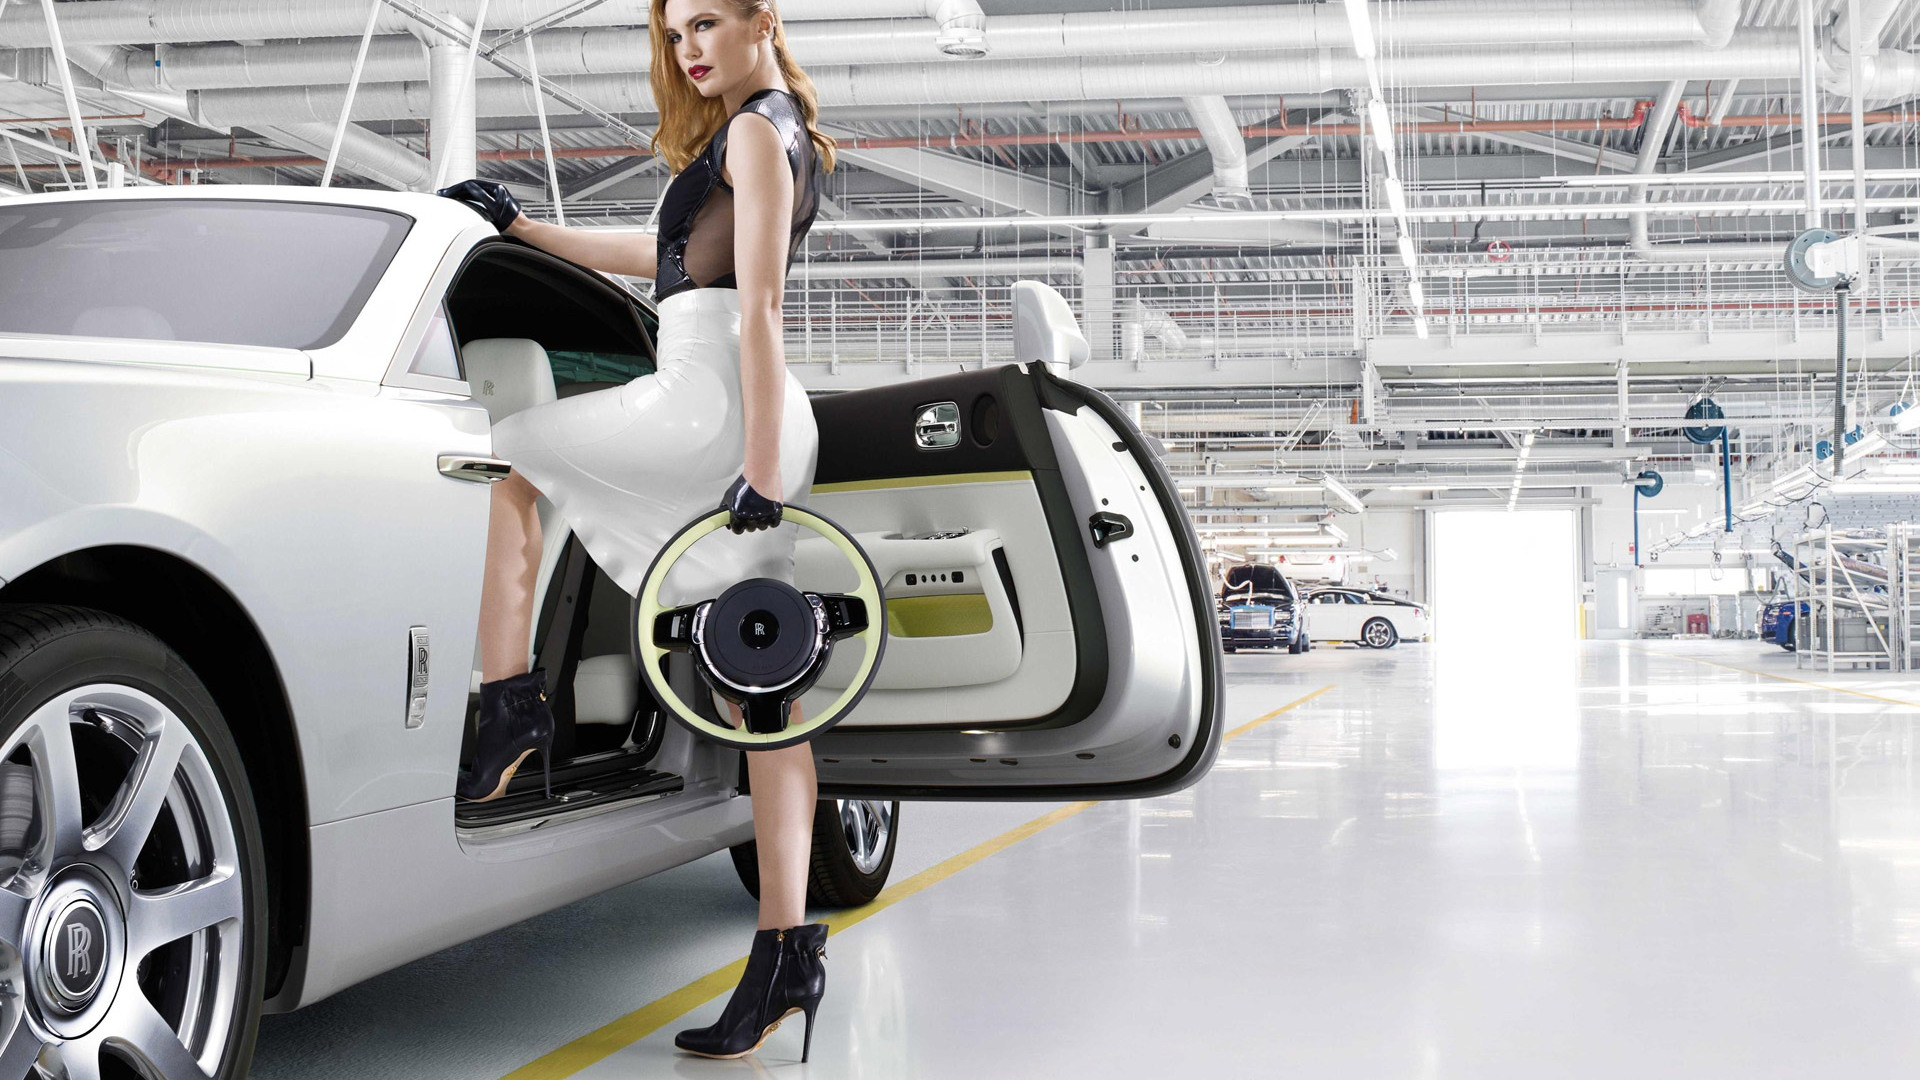 Rolls-Royce Wraith - Inspired by Fashion